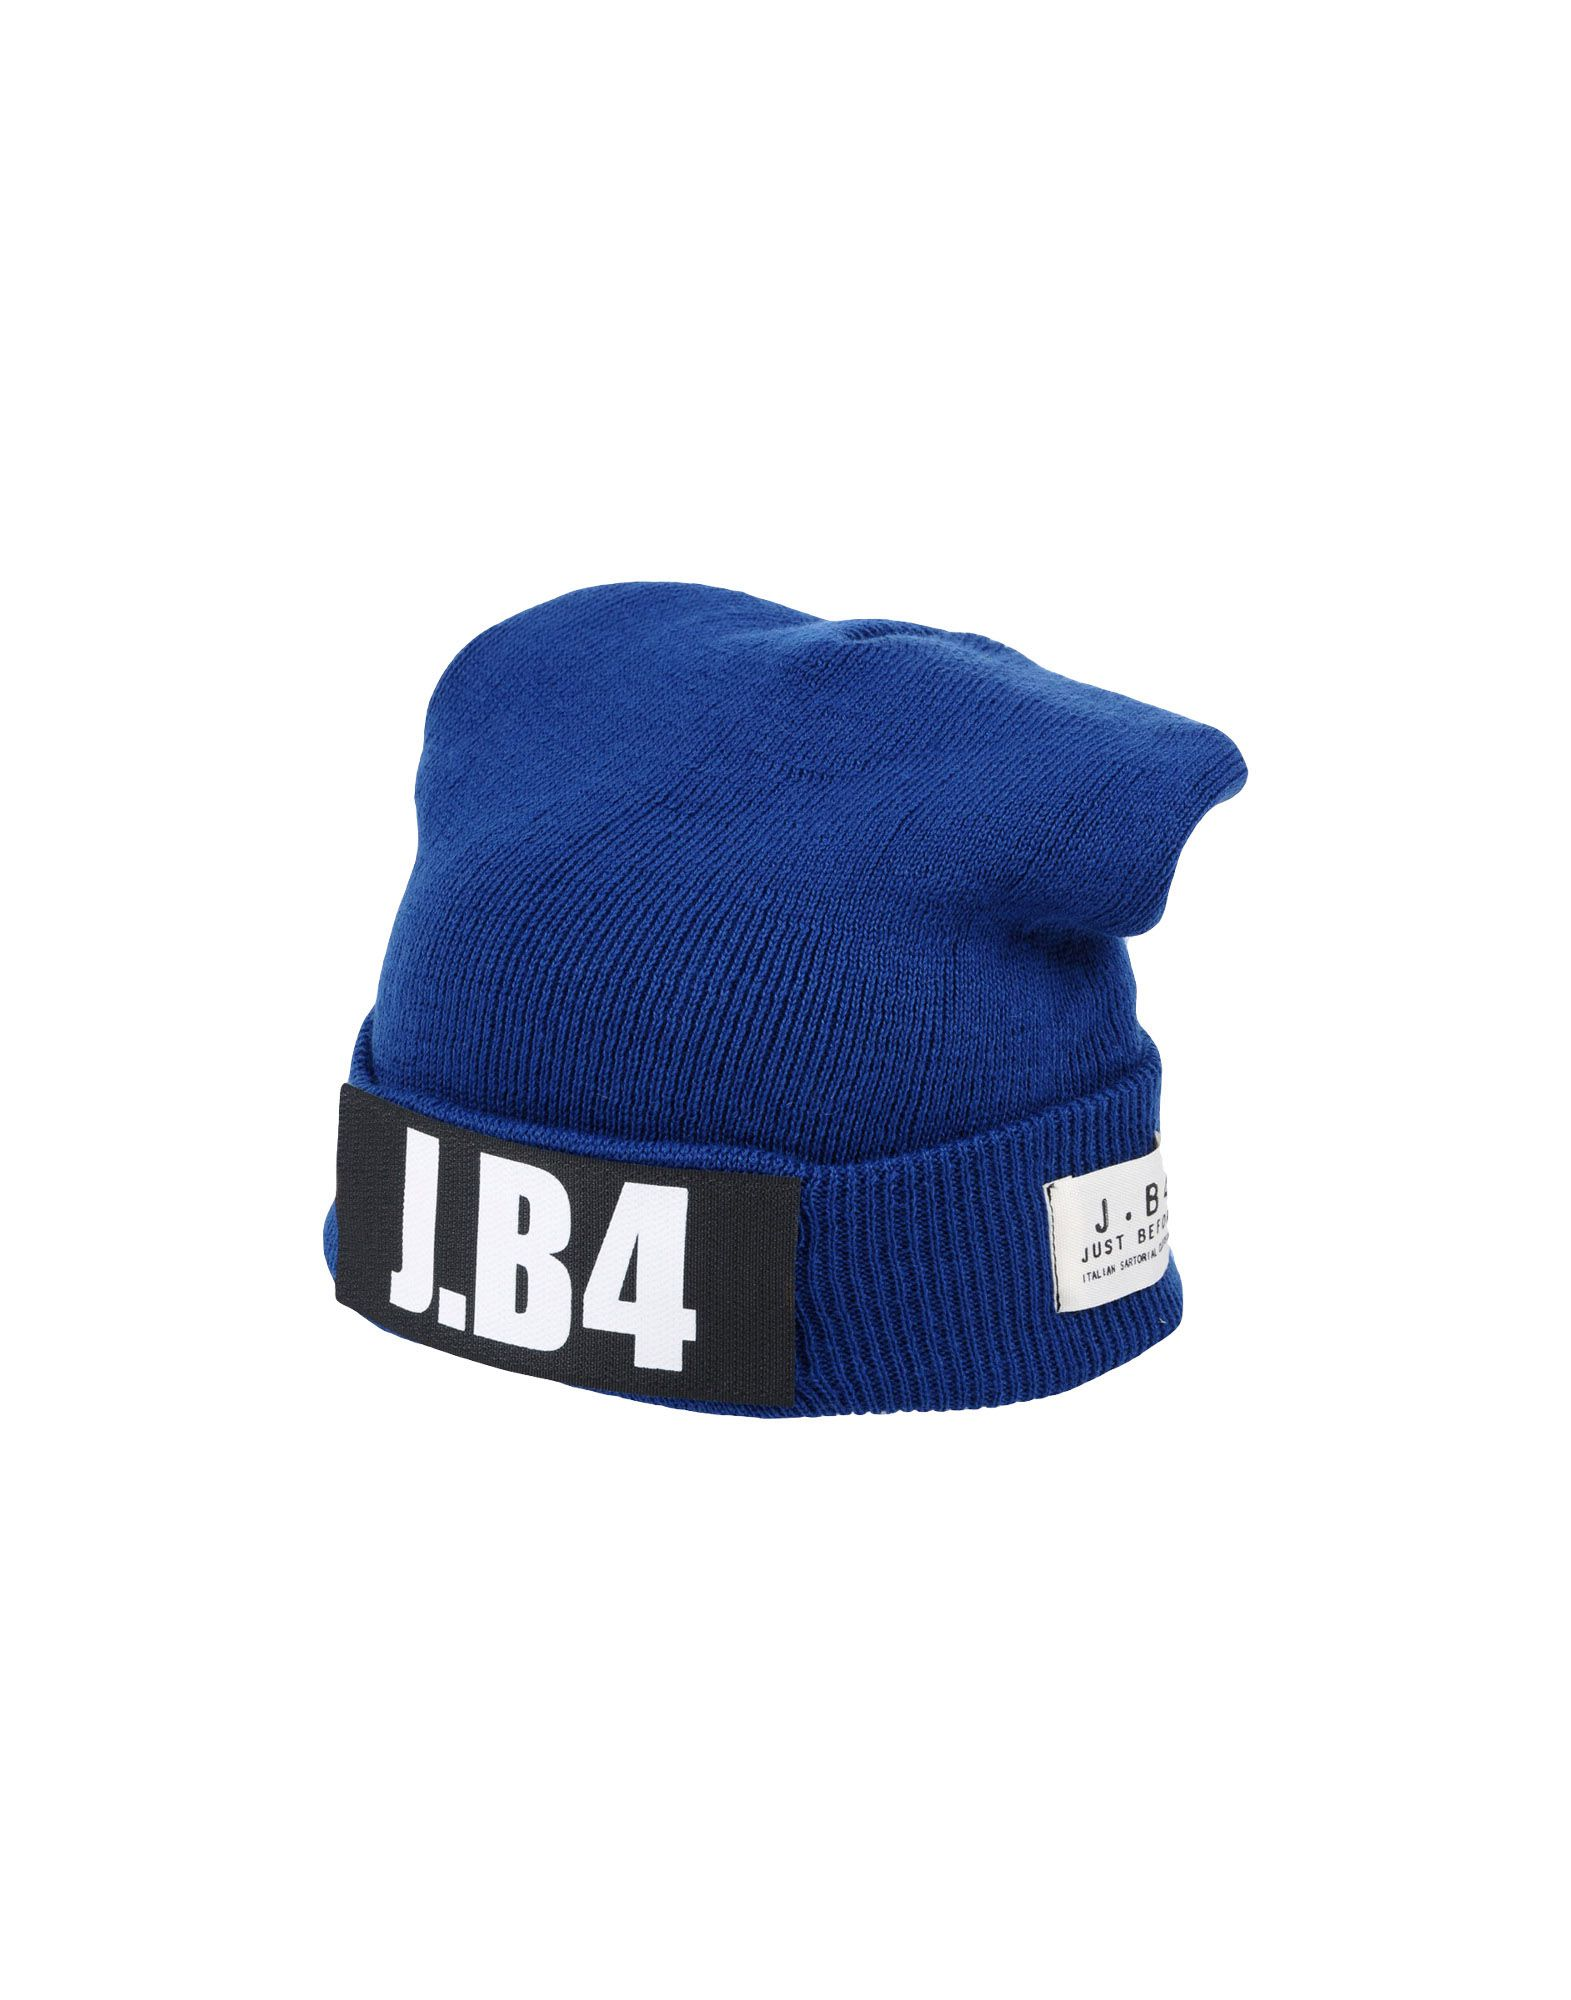 J·B4 JUST BEFORE Головной убор j·b4 just before свитер